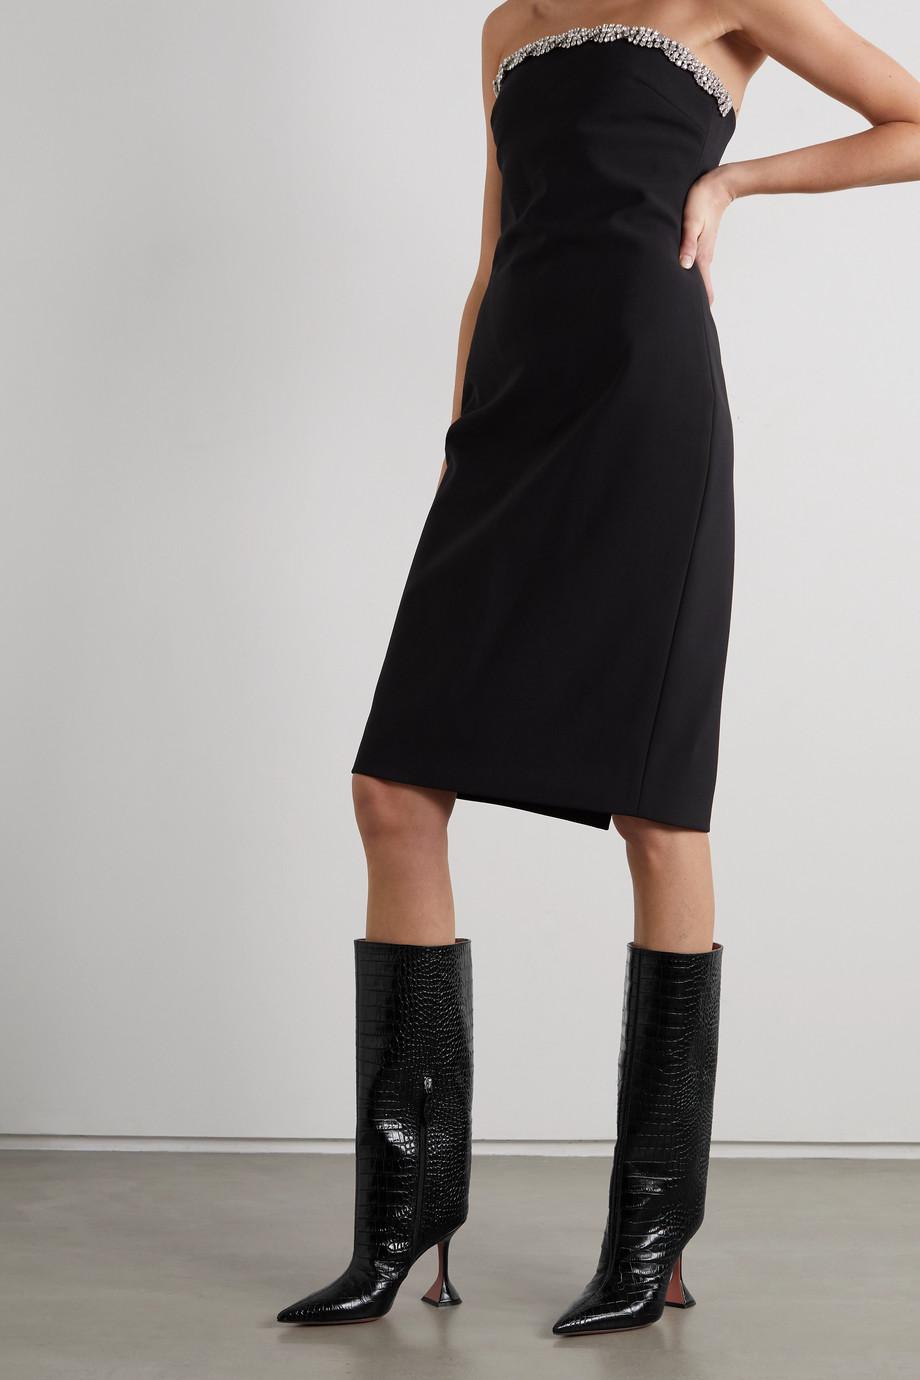 Amina Muaddi Rain croc-effect leather knee boots